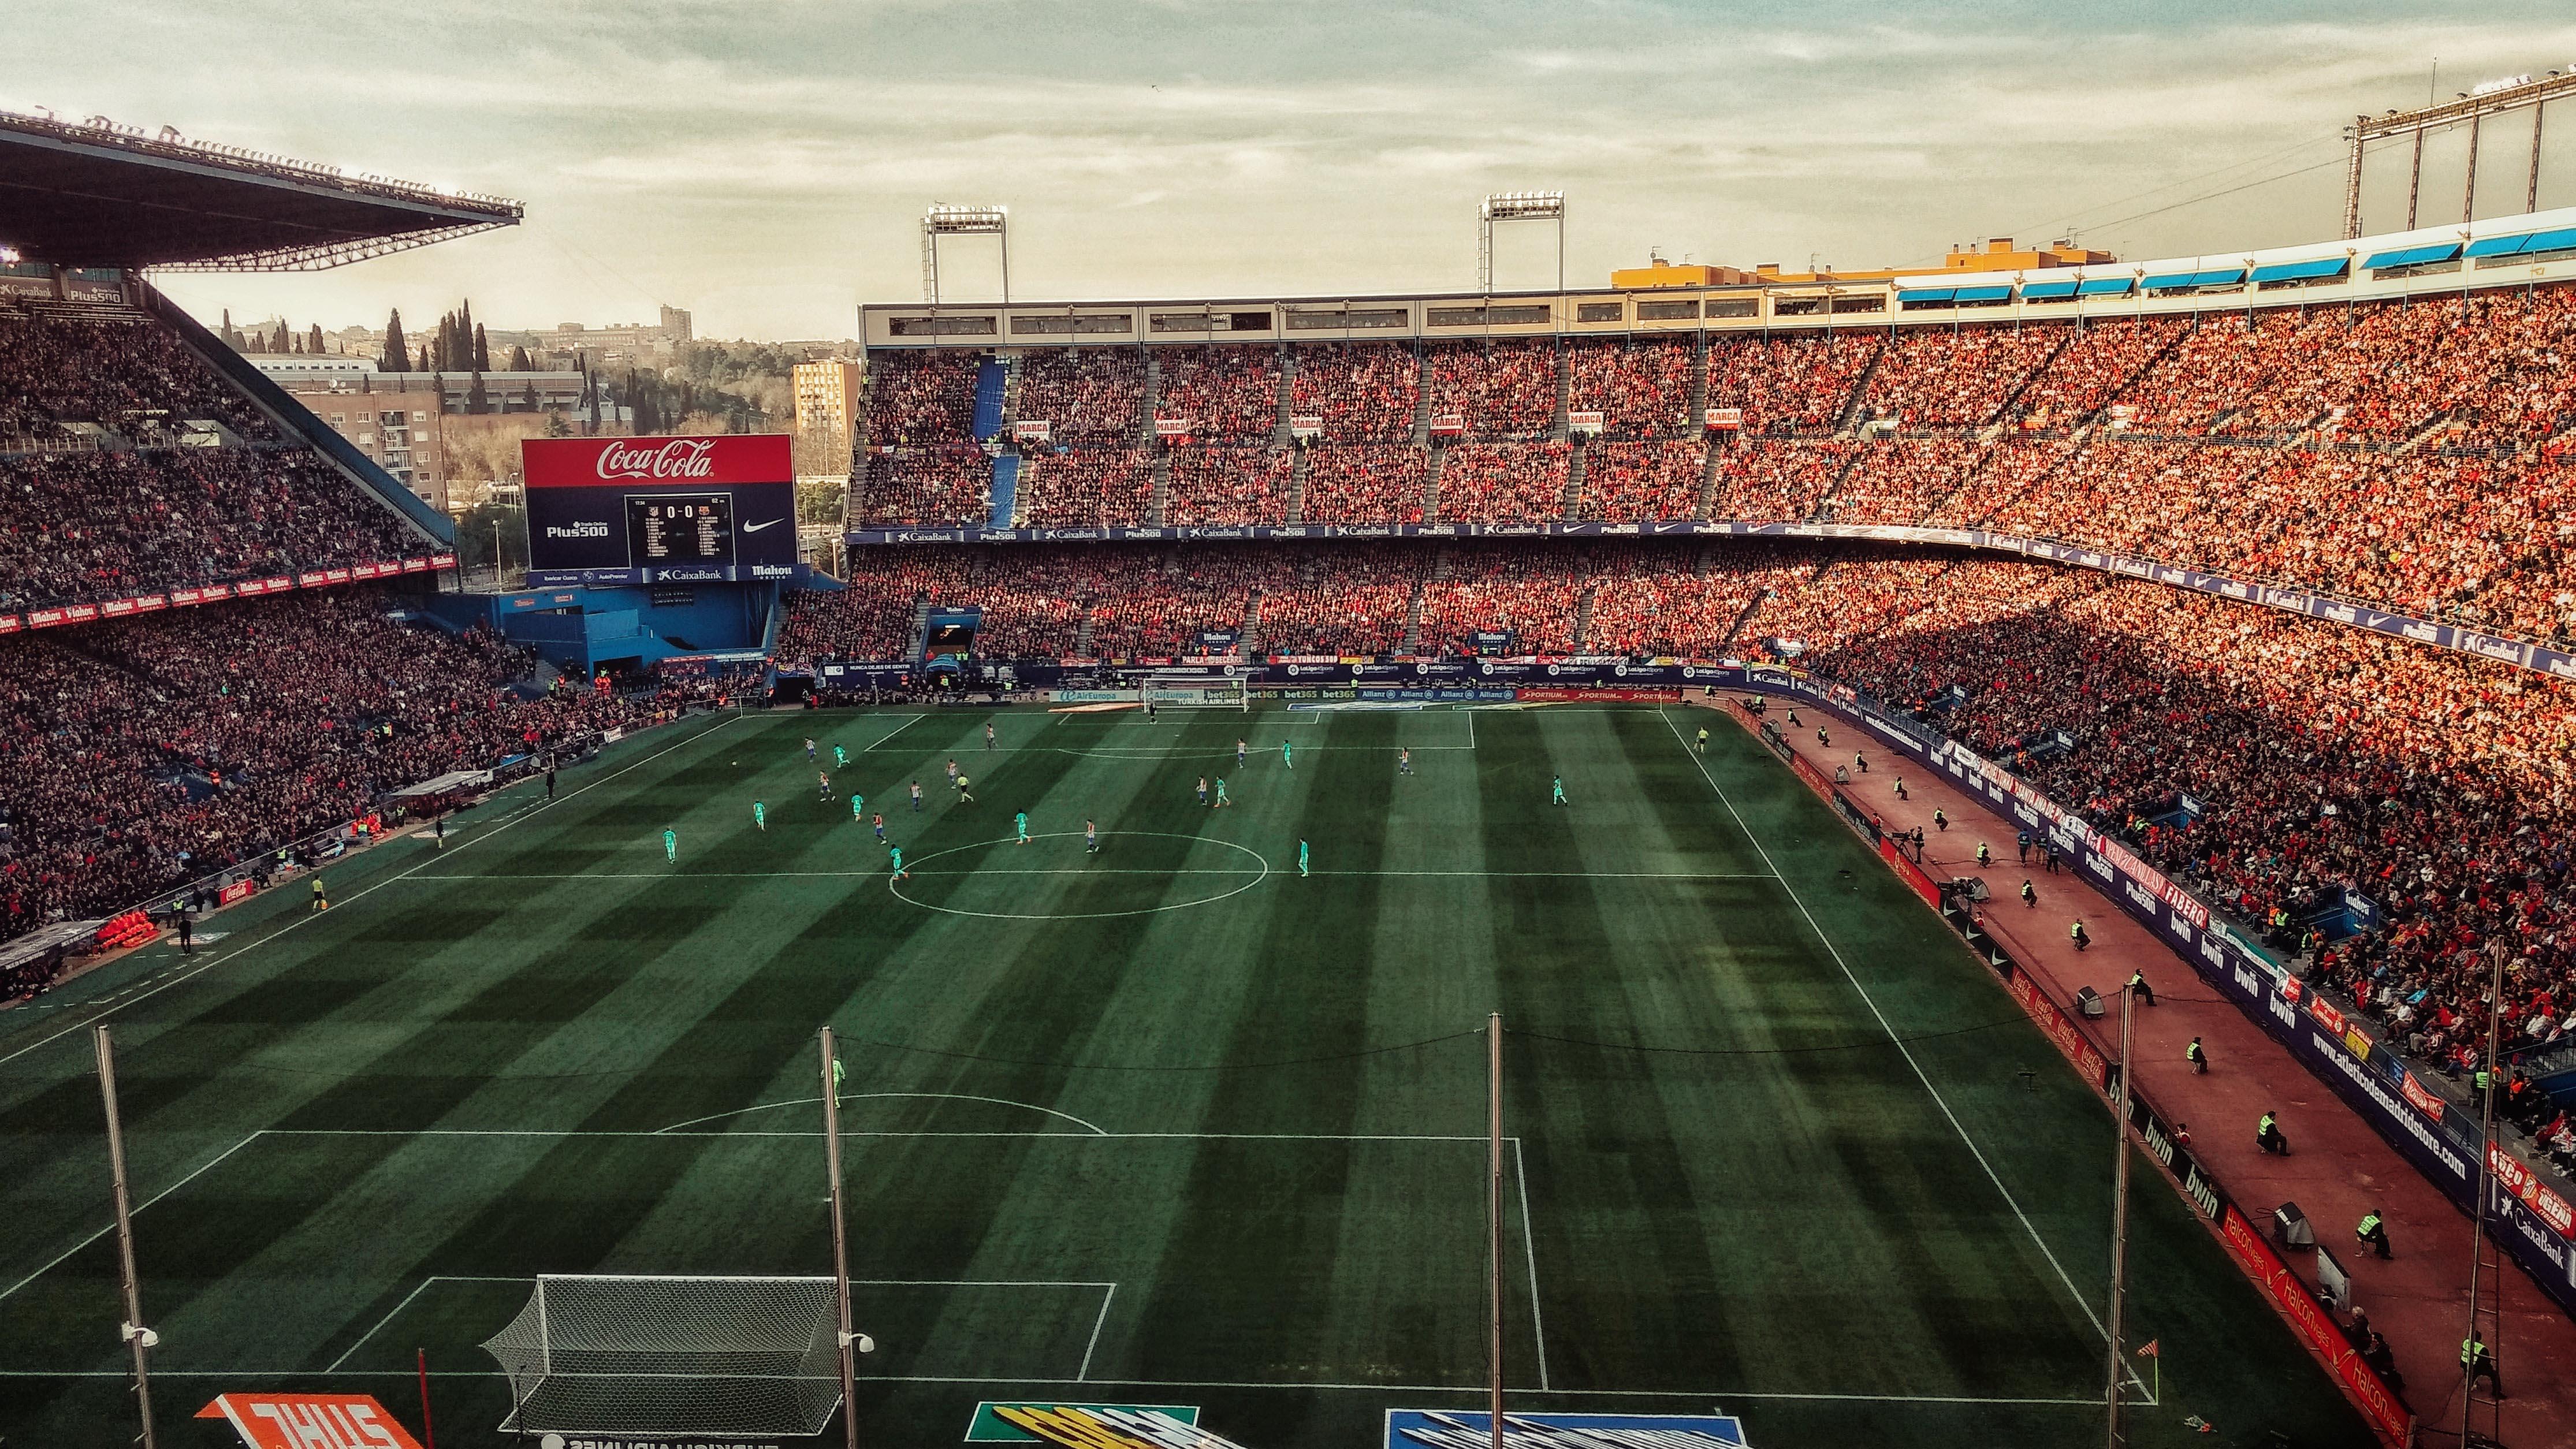 15 Juin : Espagne - Portugal